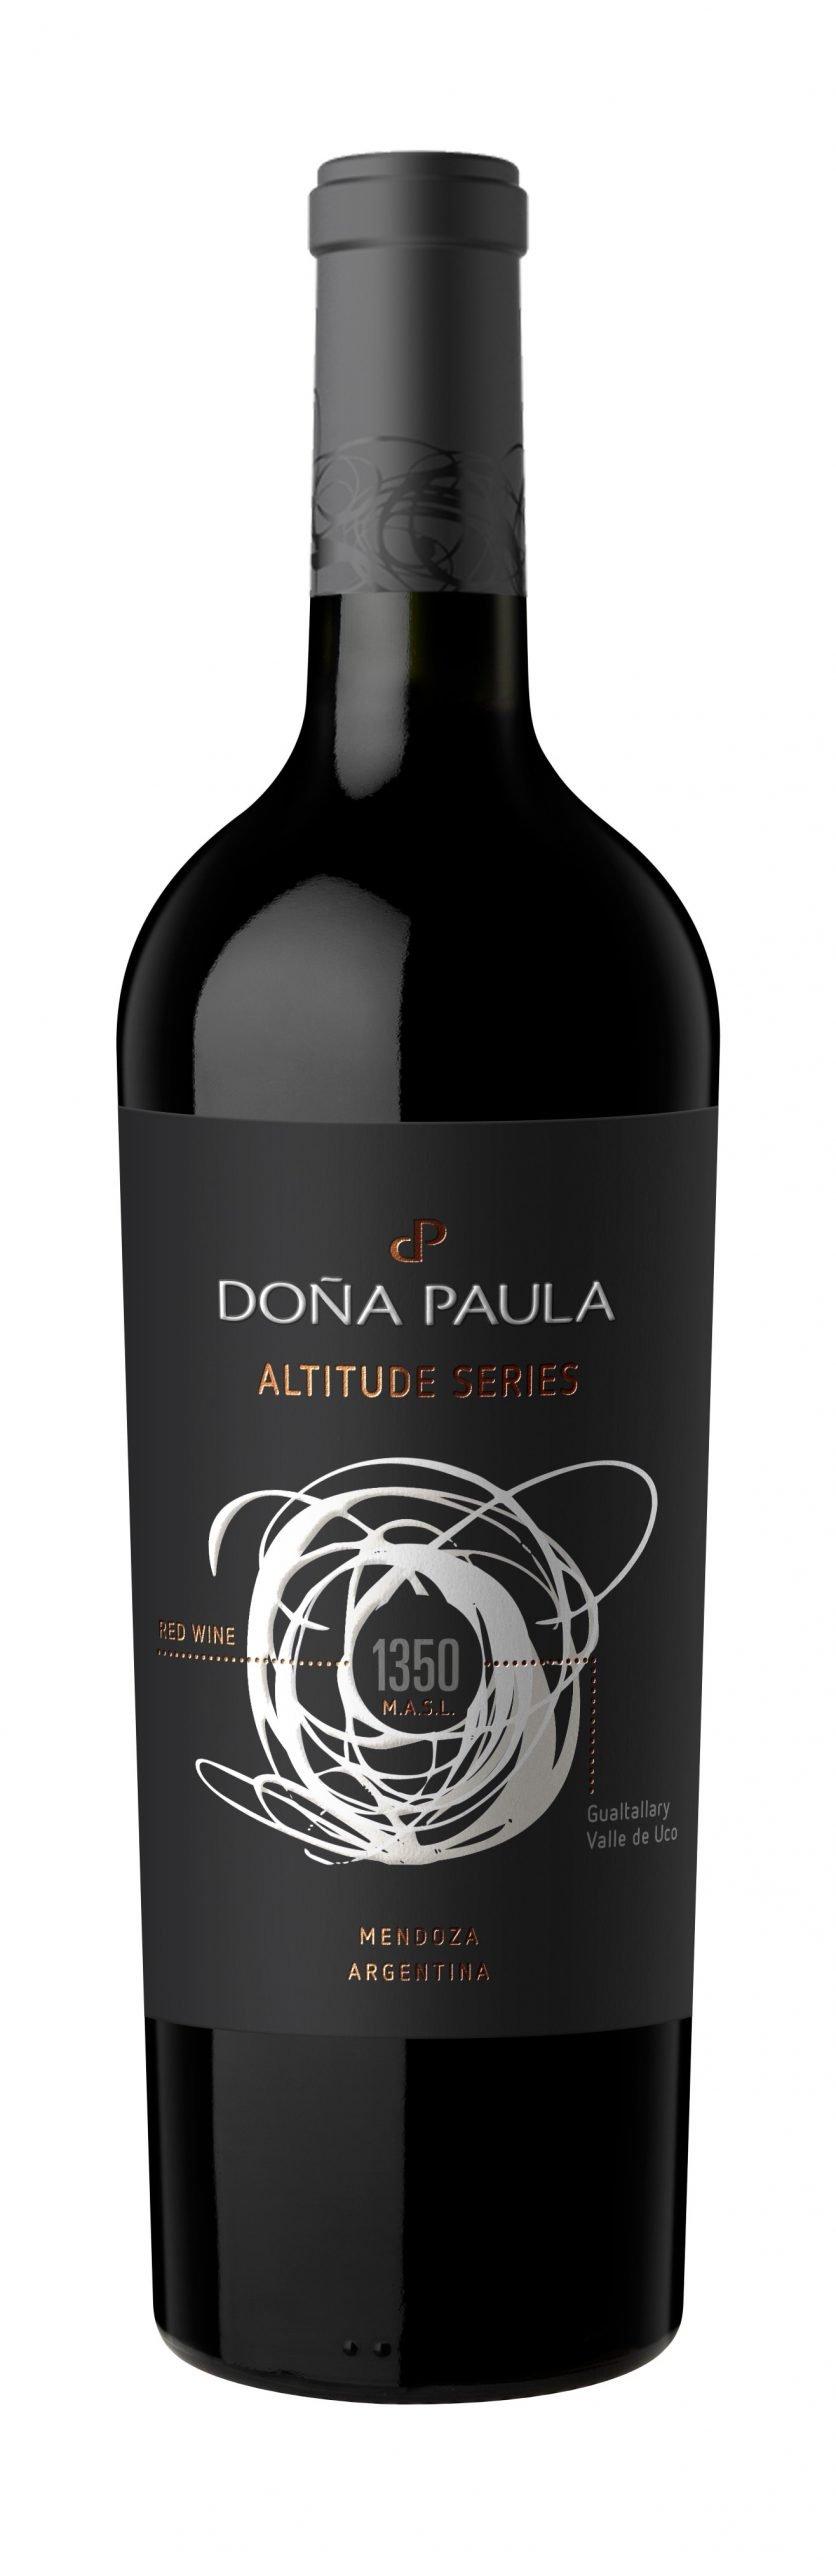 Doña Paula Altitude Series 1350